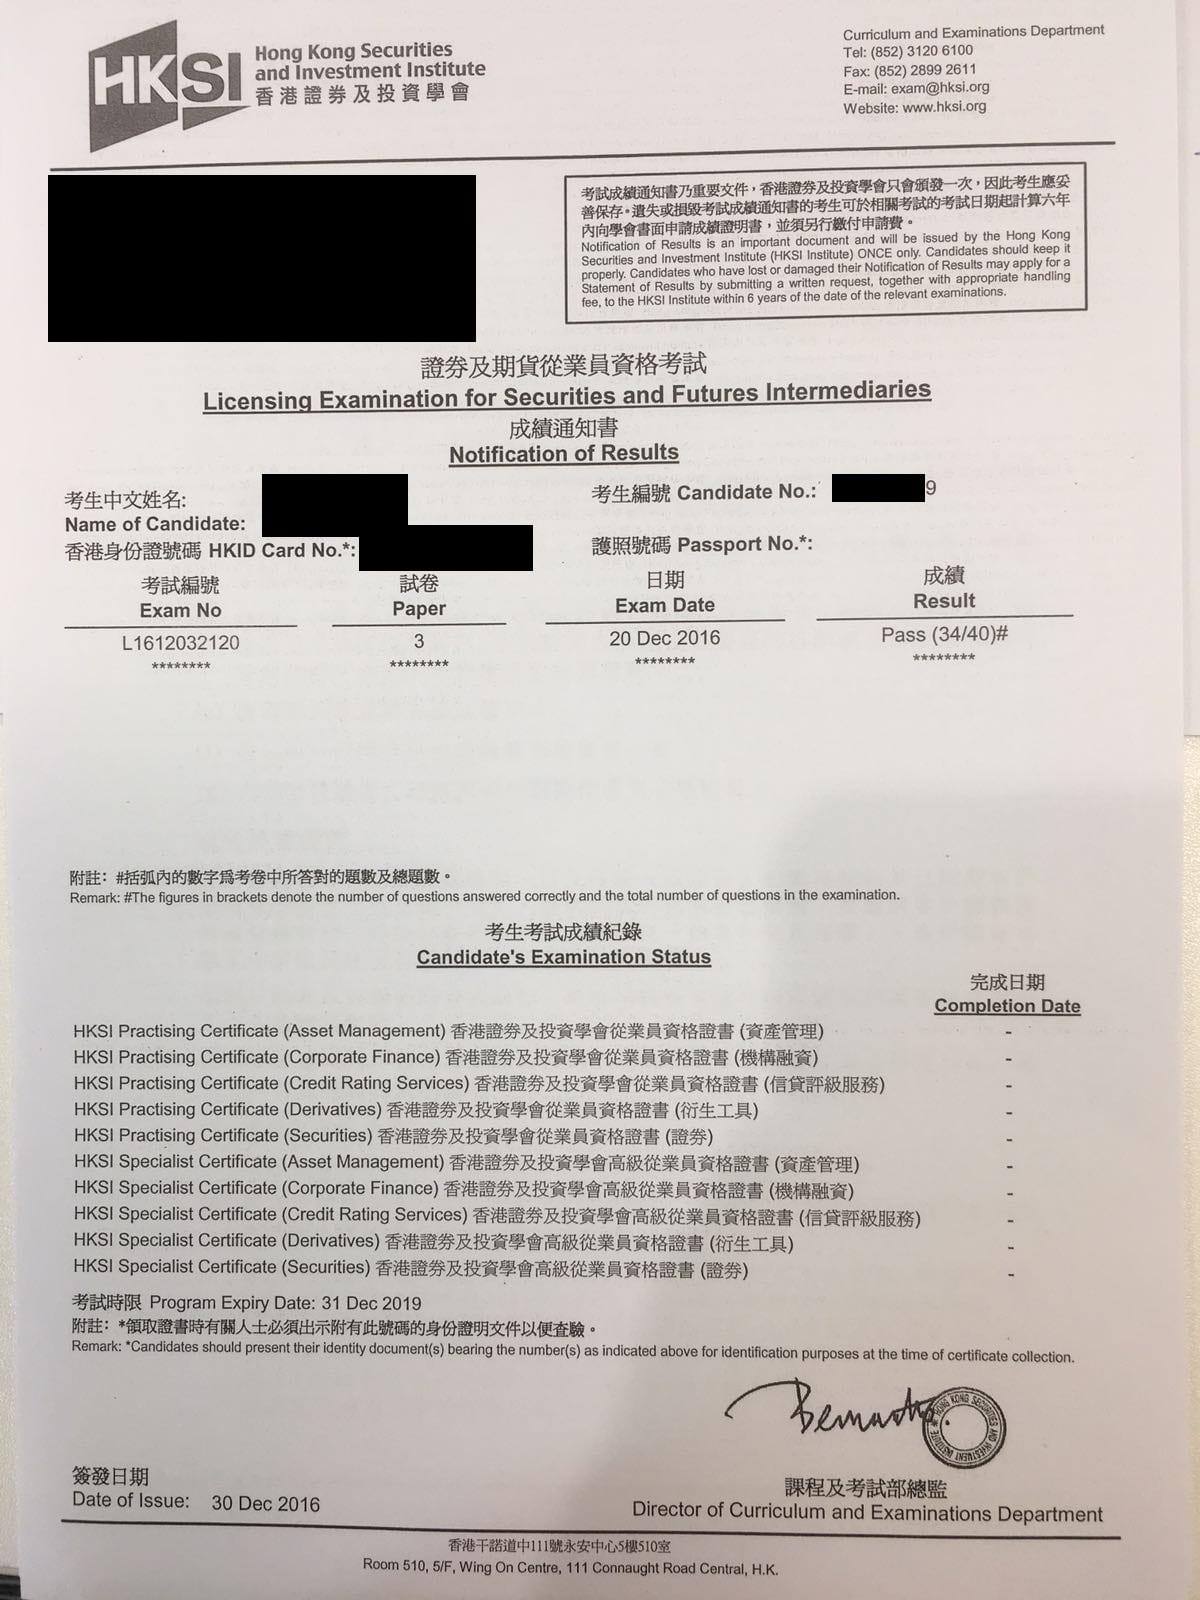 CWN 20/12/2016 LE Paper 3 證券期貨從業員資格考試卷三 Pass